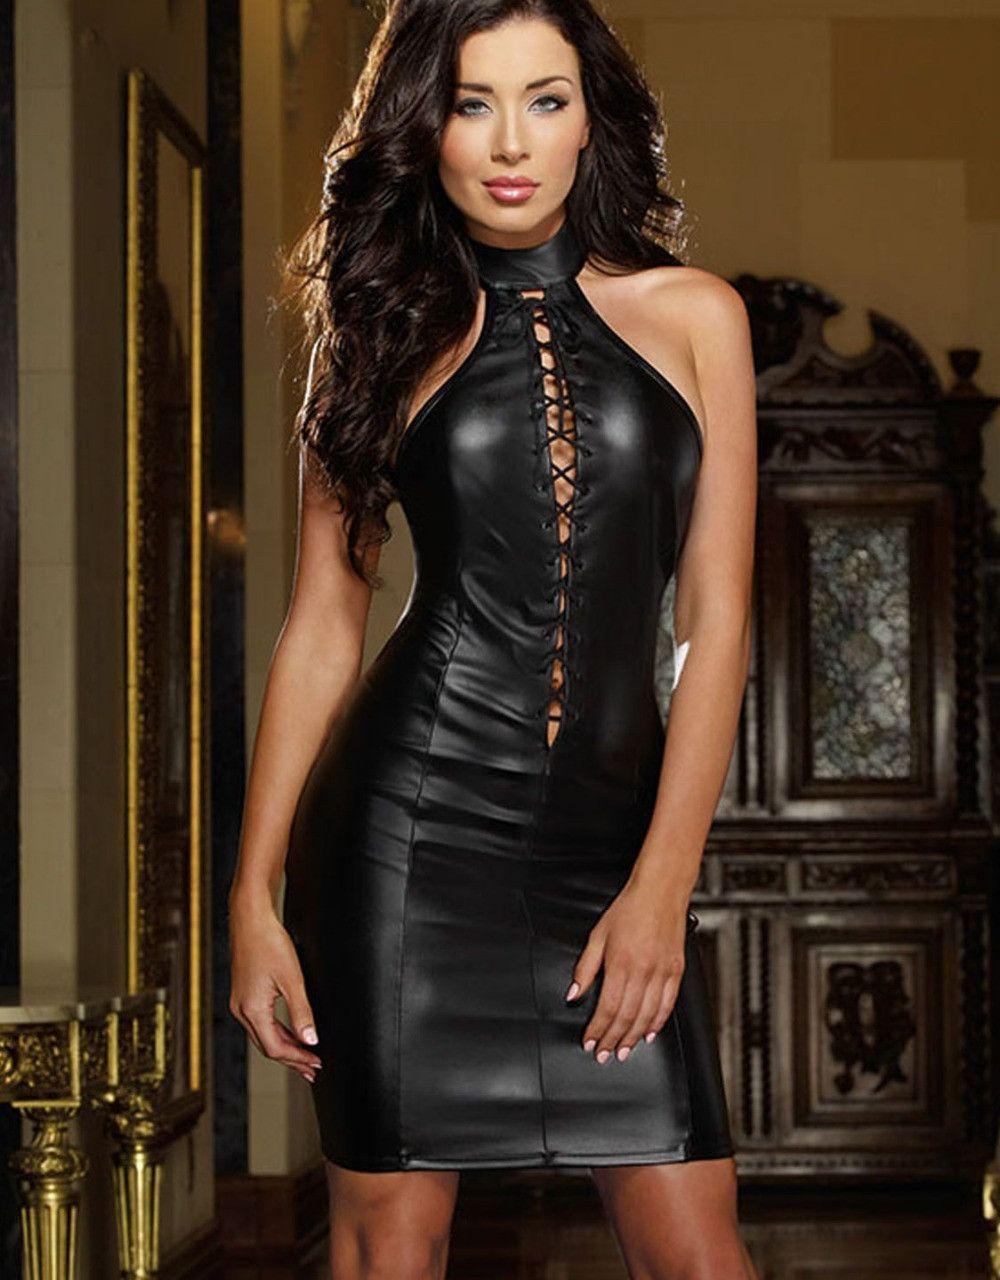 Sexy Leather Dress Price Fashion Black Women Club Dress High ...